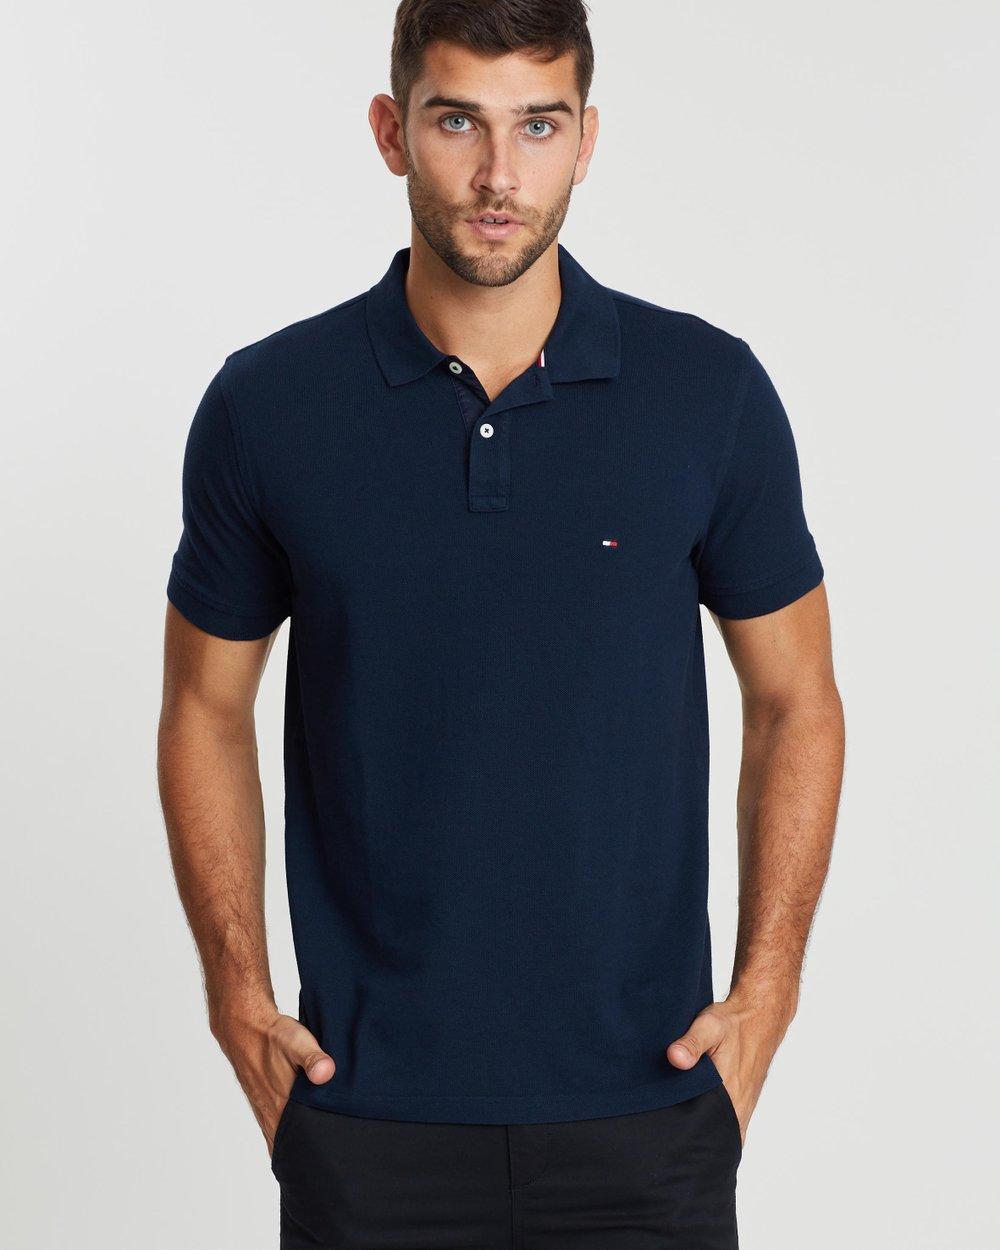 47a7120b560ede WCC Back Logo Regular Polo Shirt by Tommy Hilfiger Online